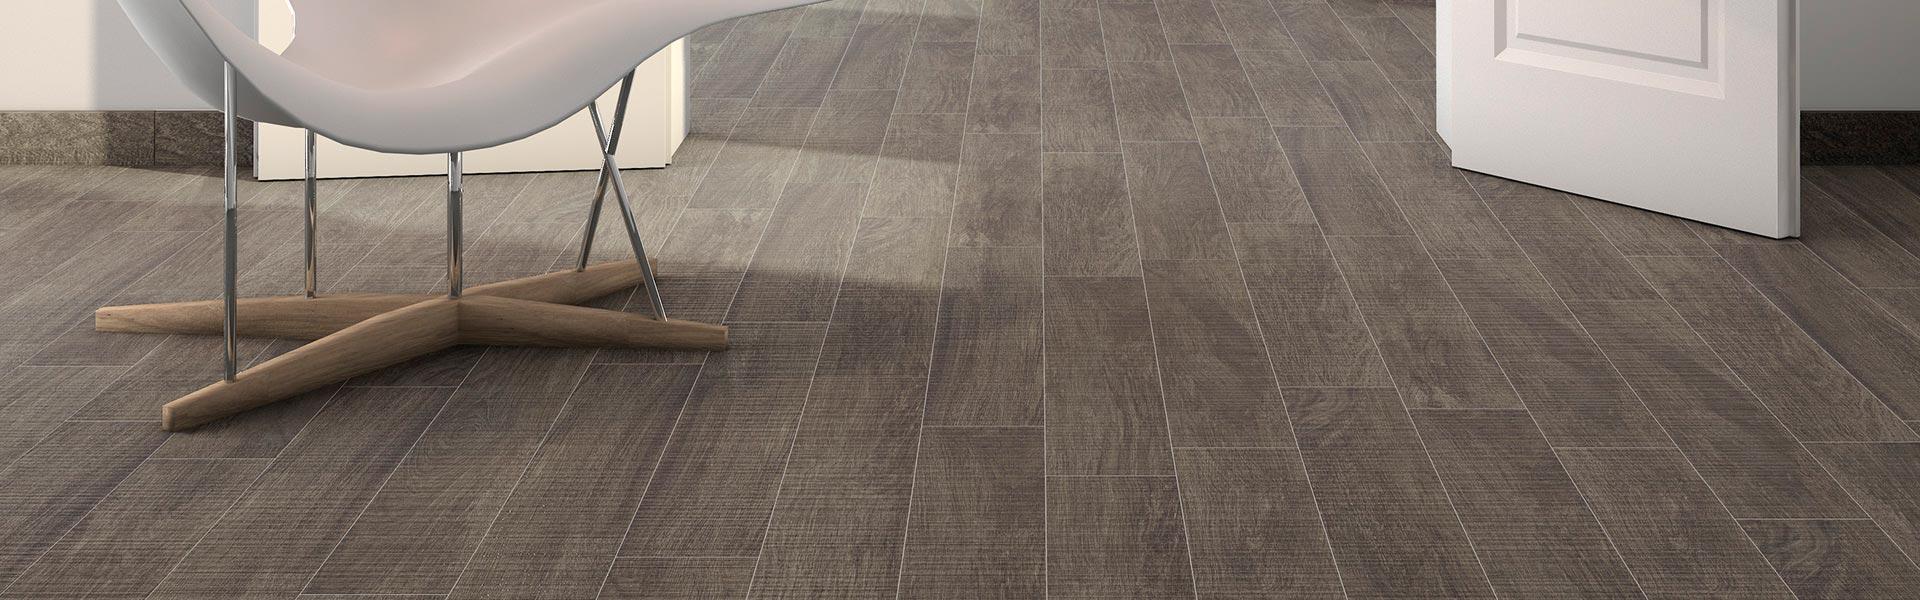 Vives floor tiles porcelain nora 218x893 nora porcelain floor tiles by vives azulejos y gres sa dailygadgetfo Images